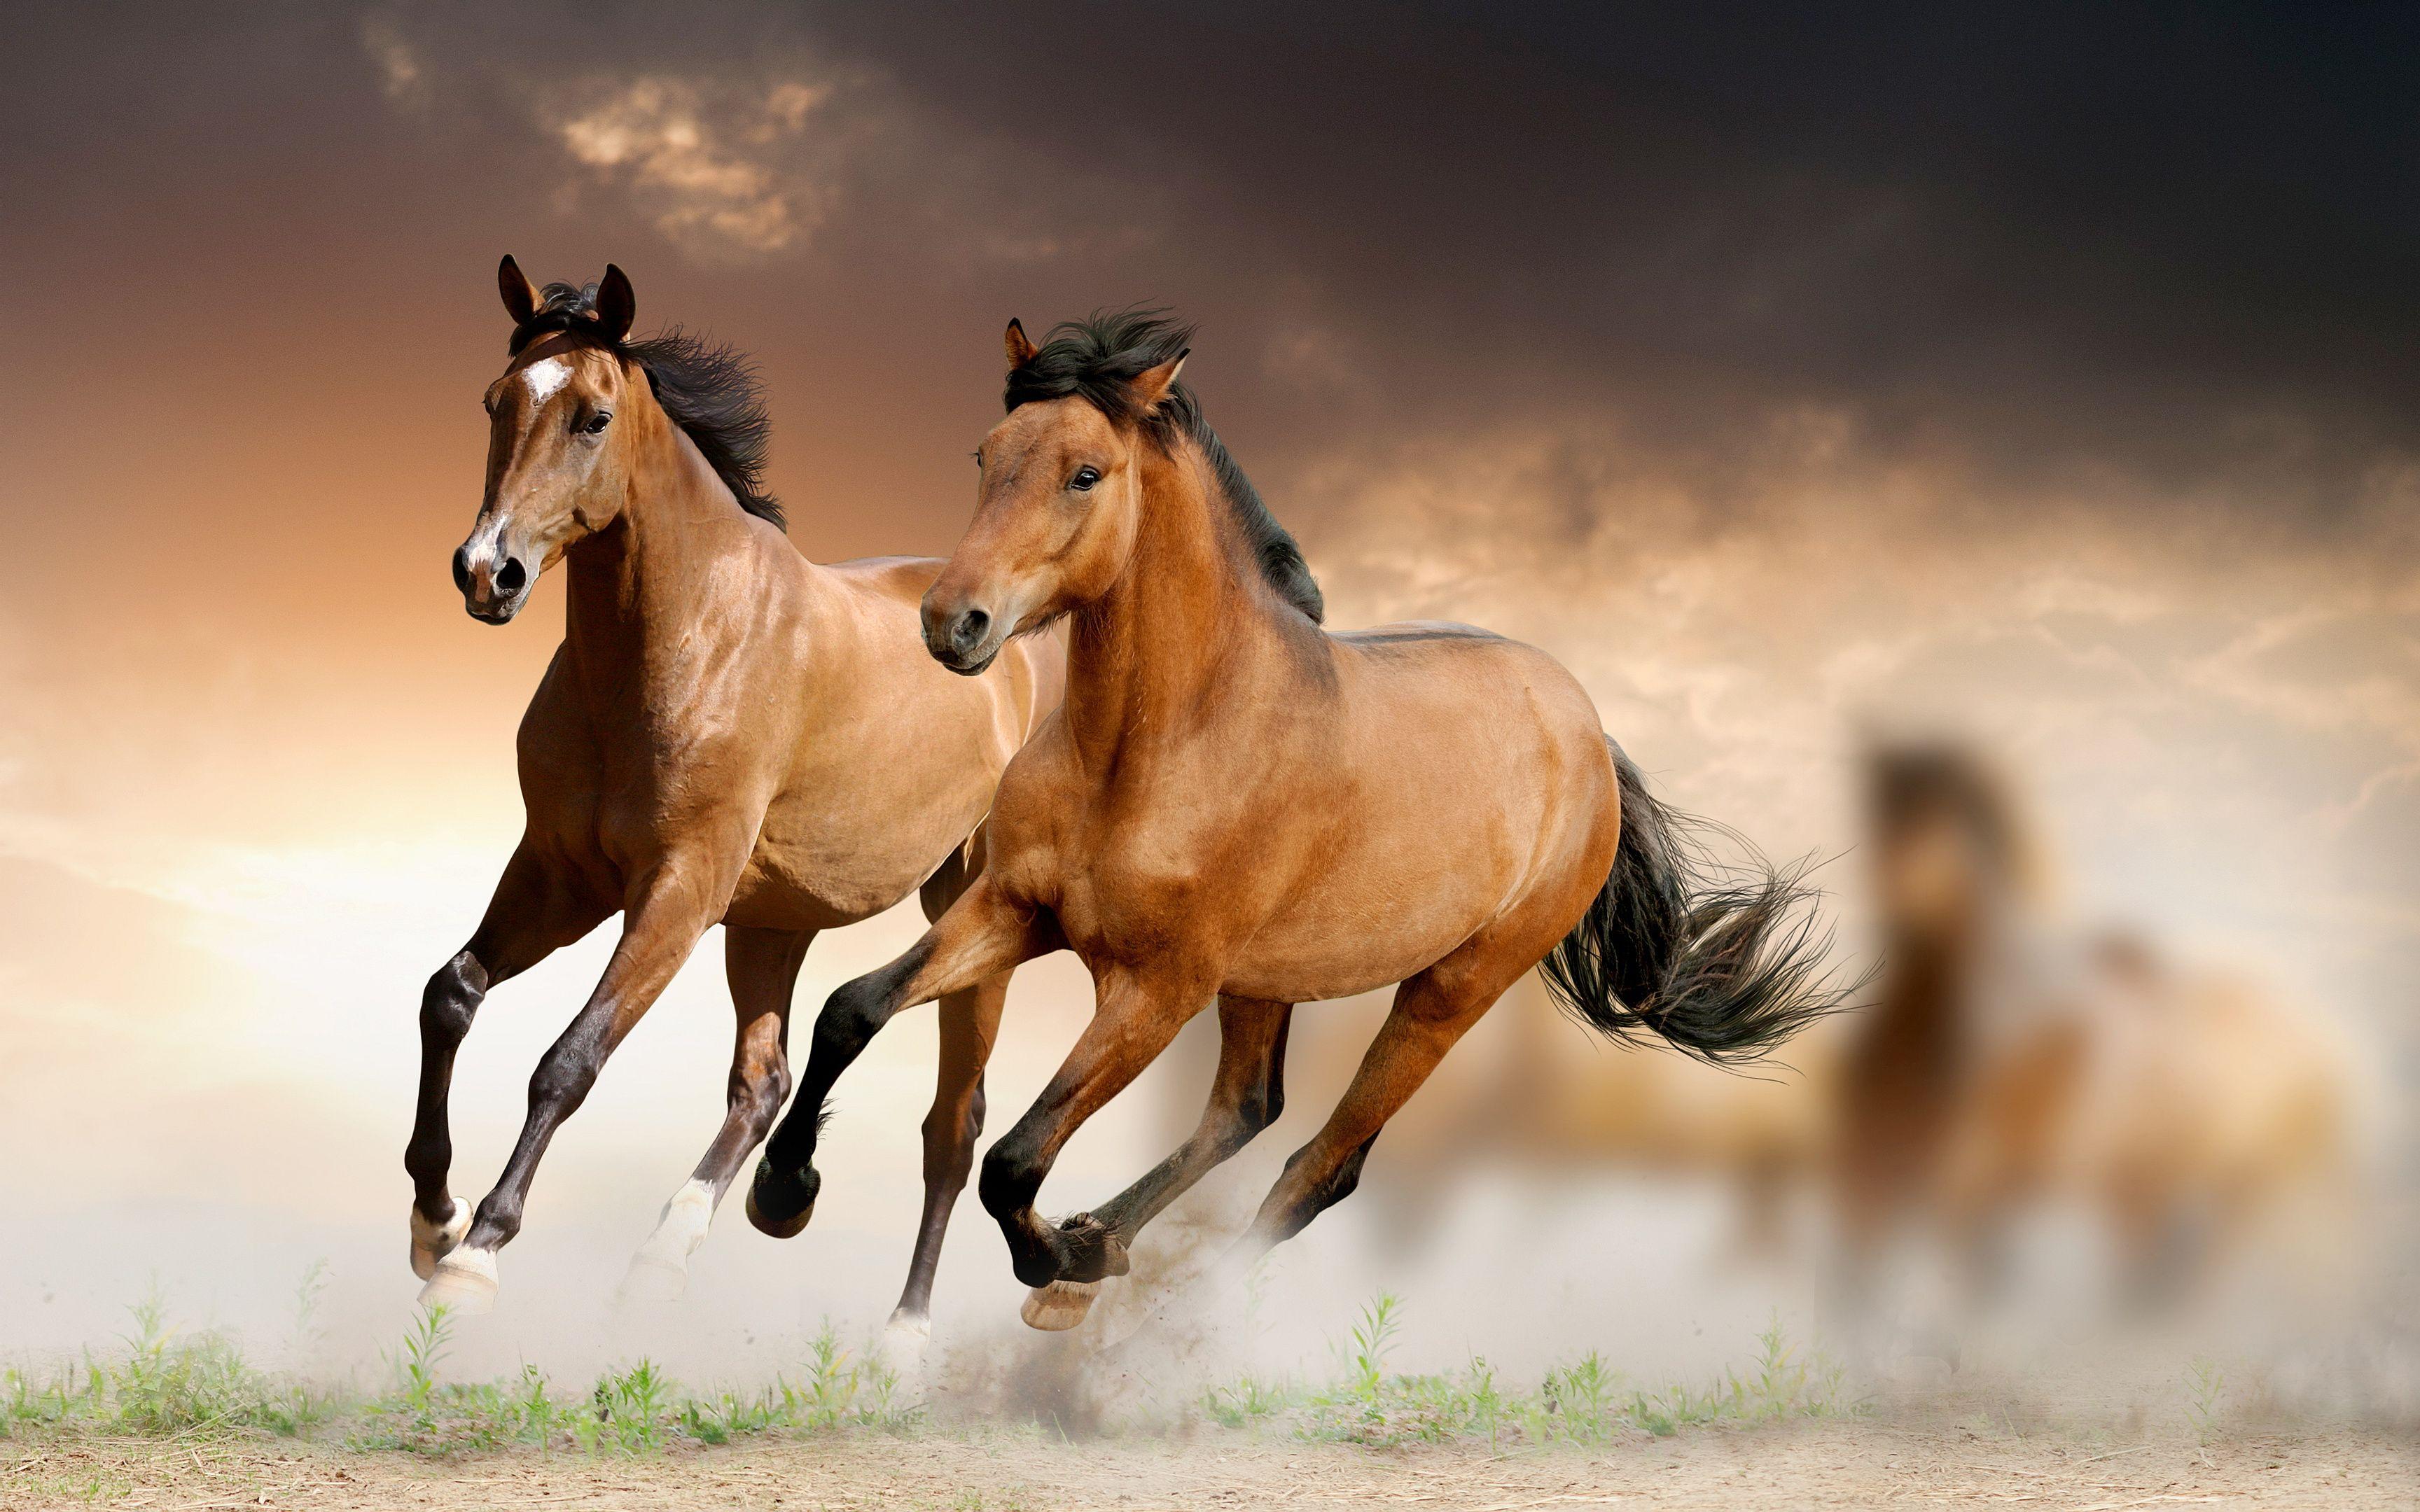 Horse Shoes Horse wallpaper, Horses, Beautiful horses